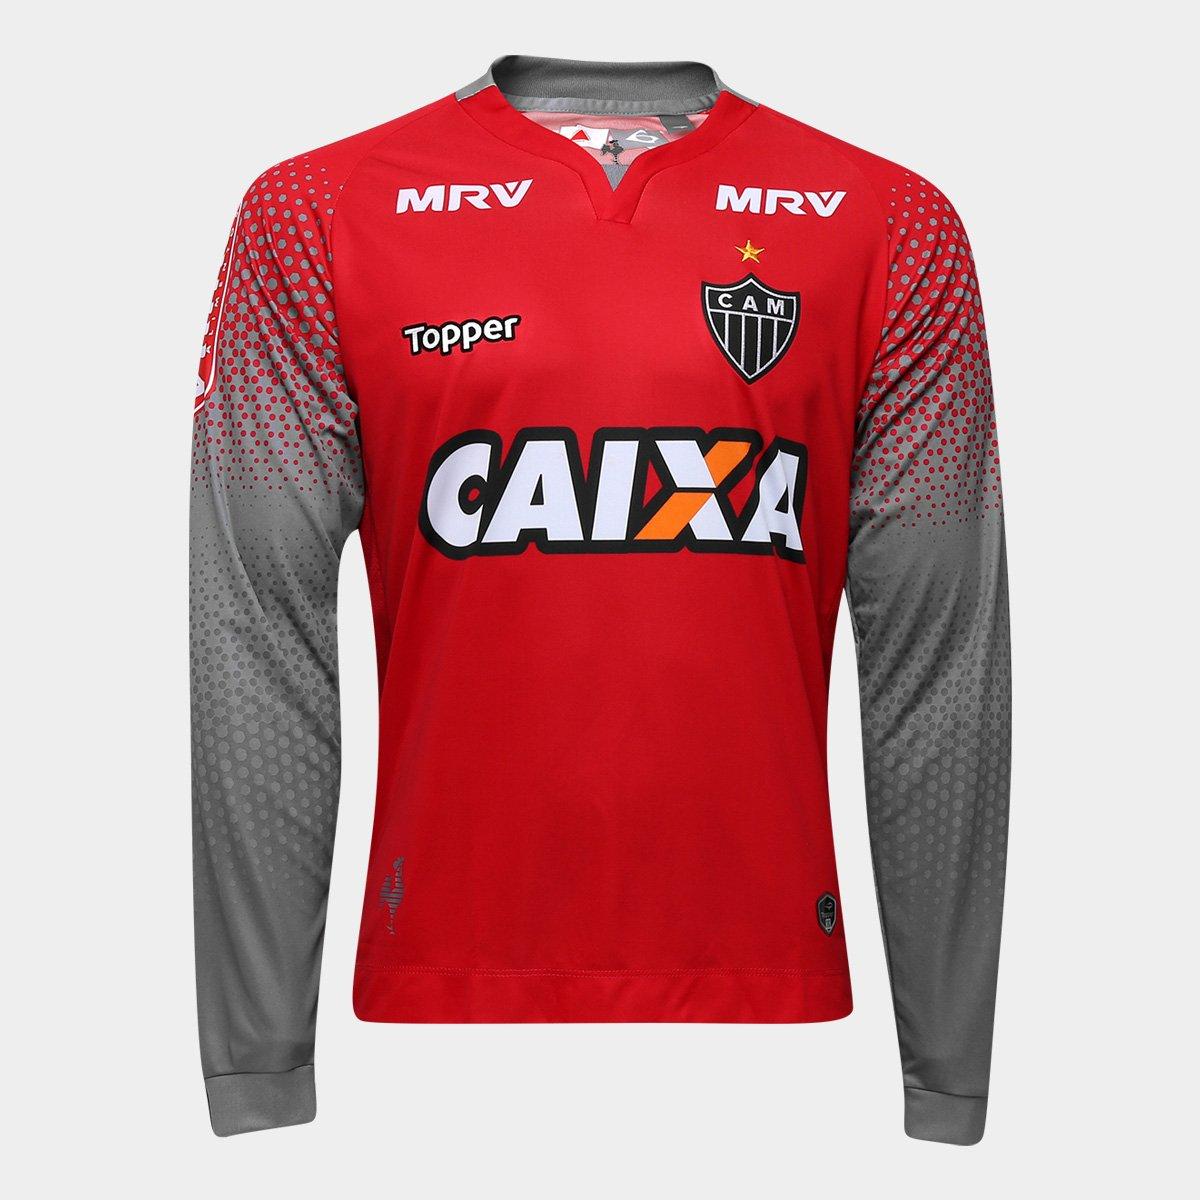 Camisa Atlético-MG Goleiro II 17 18 Manga Longa nº 1 - Torcedor Topper  Masculina - Compre Agora  ef64112a37540